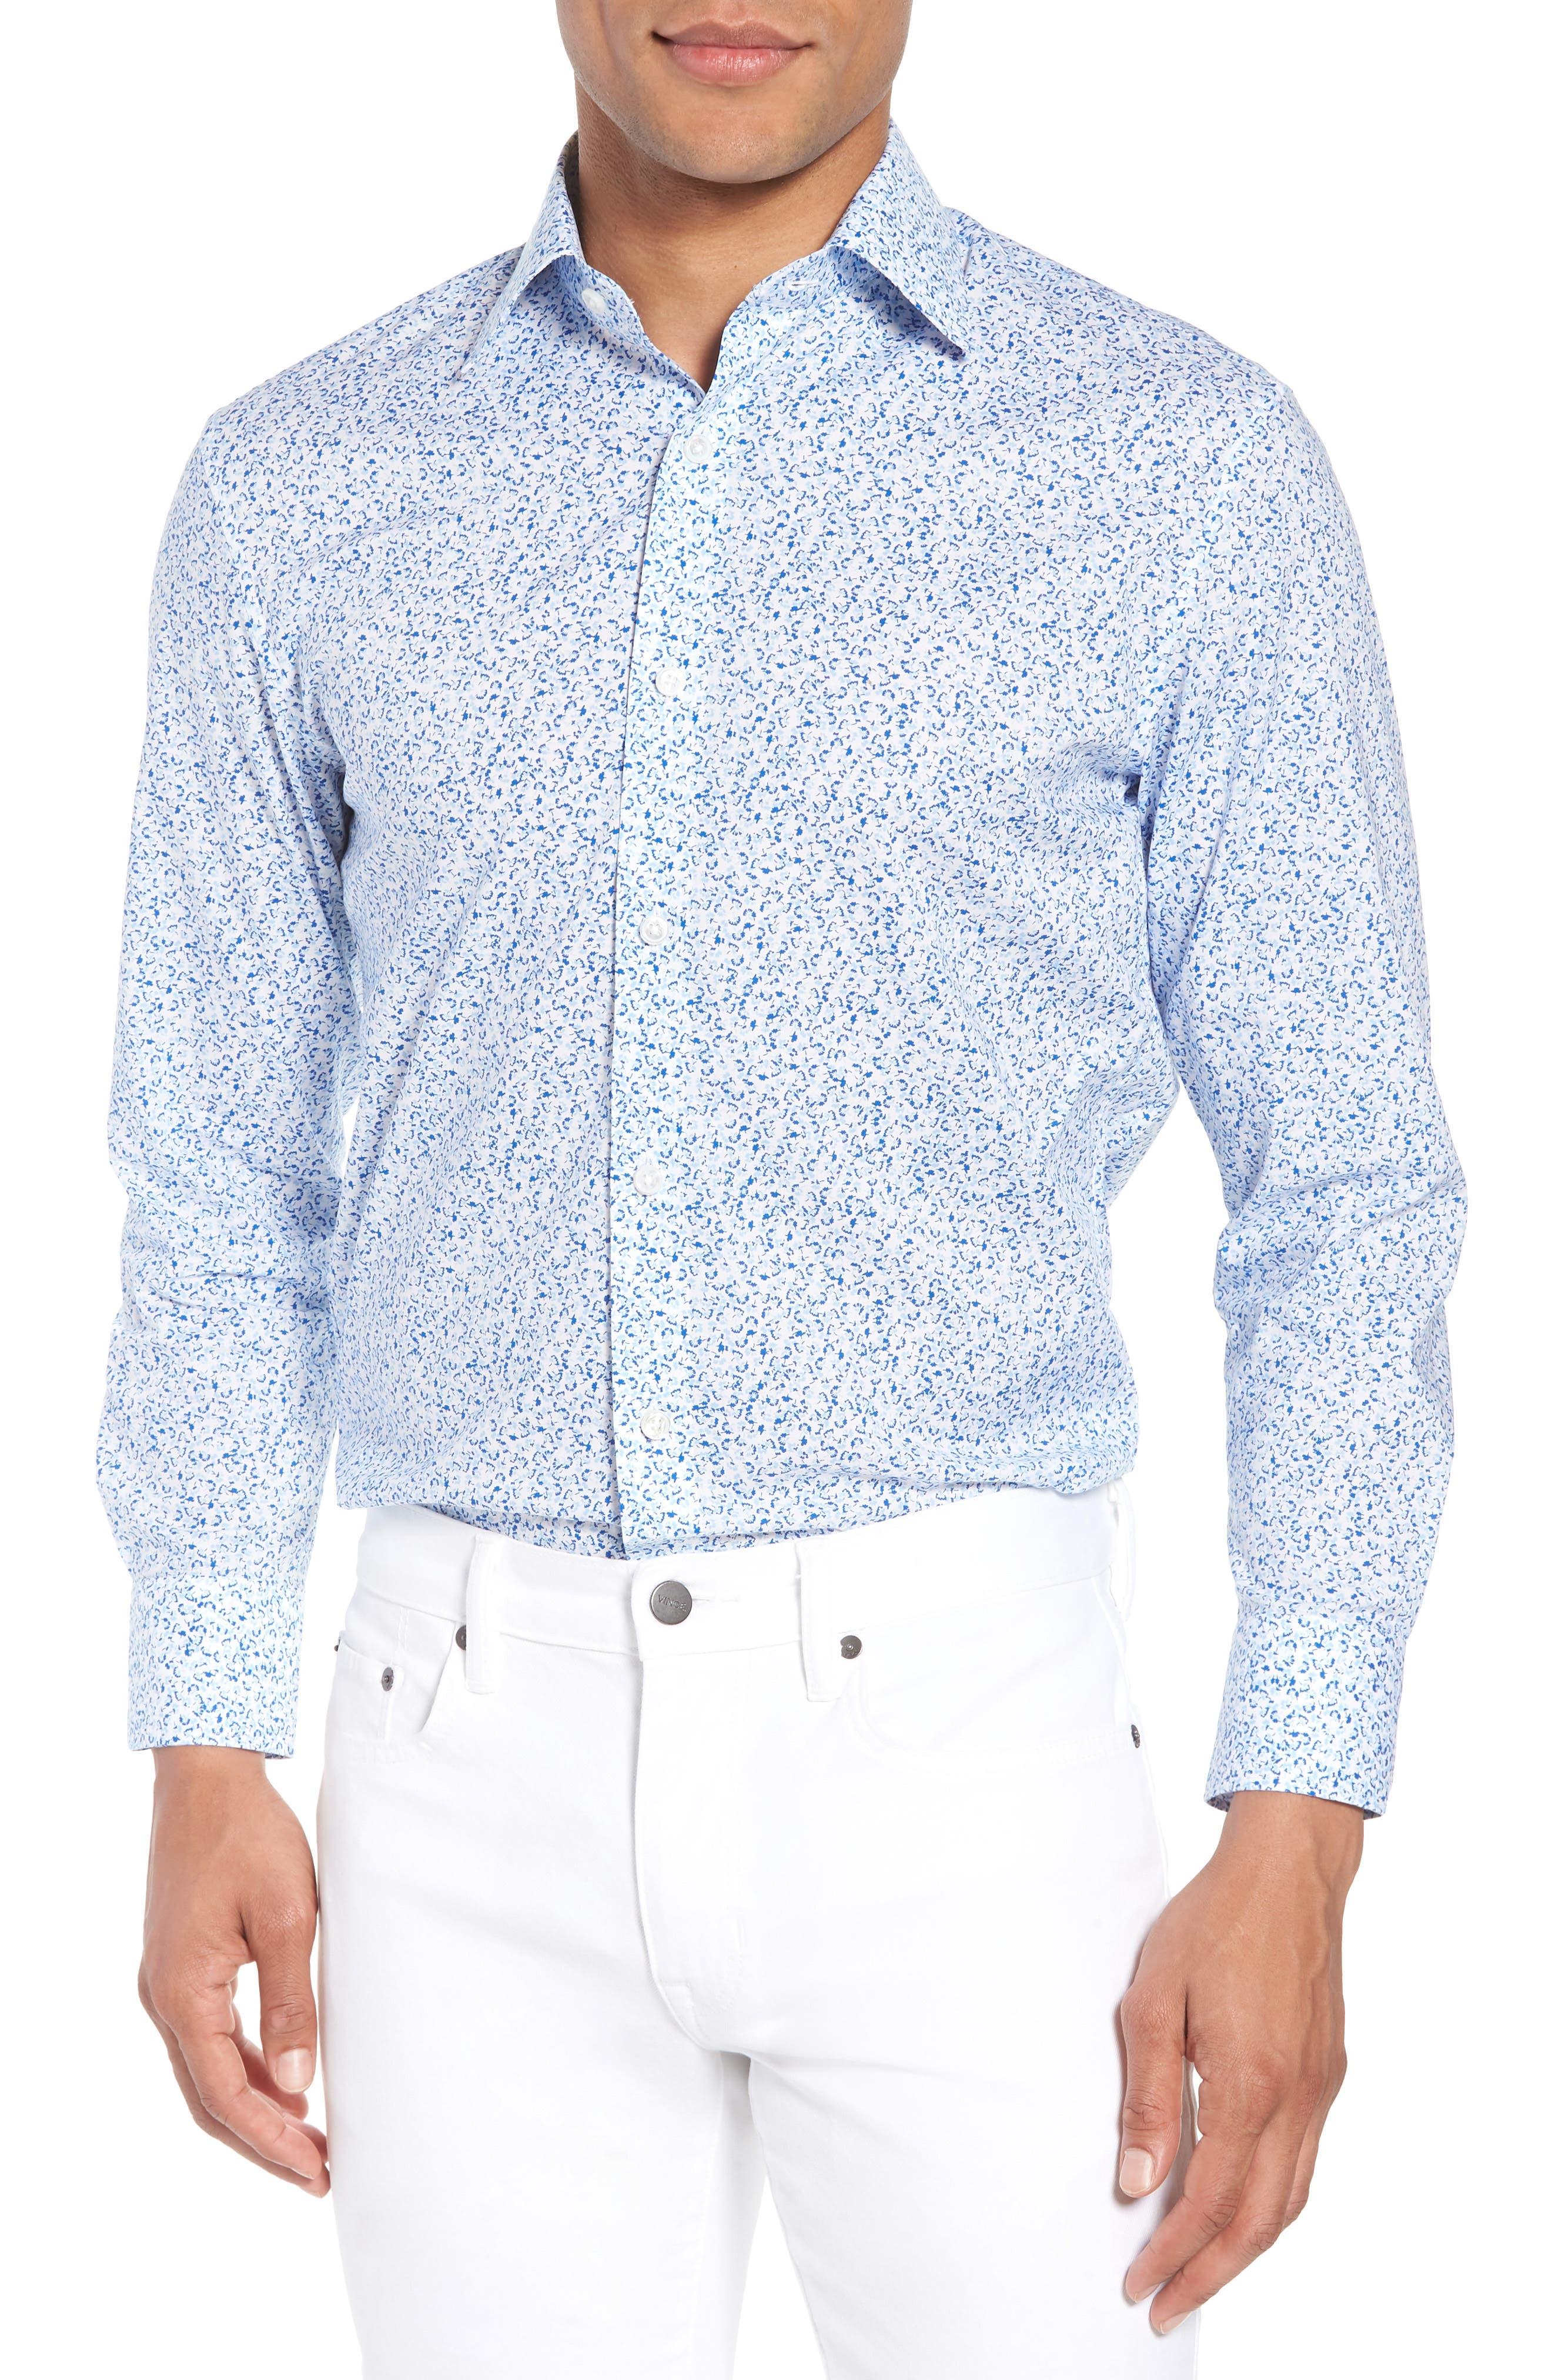 Jetsetter Slim Fit Floral Dress Shirt,                             Main thumbnail 1, color,                             Lapis Blue